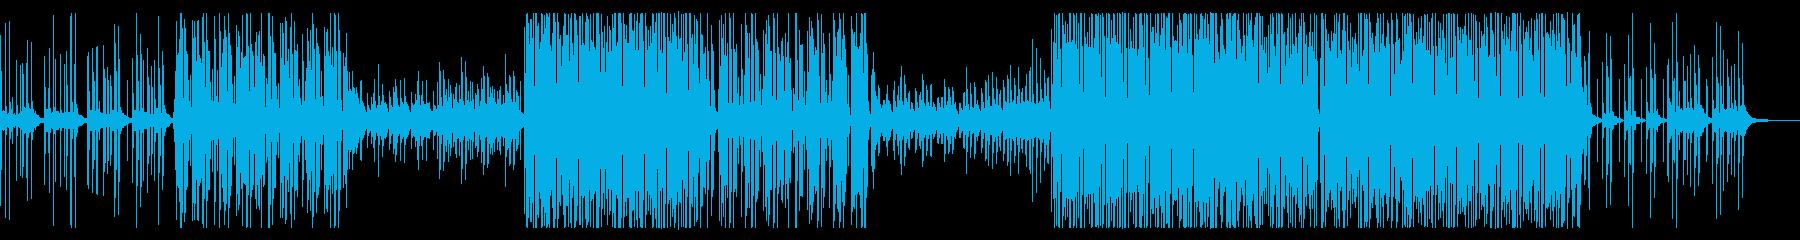 Sentosaの再生済みの波形